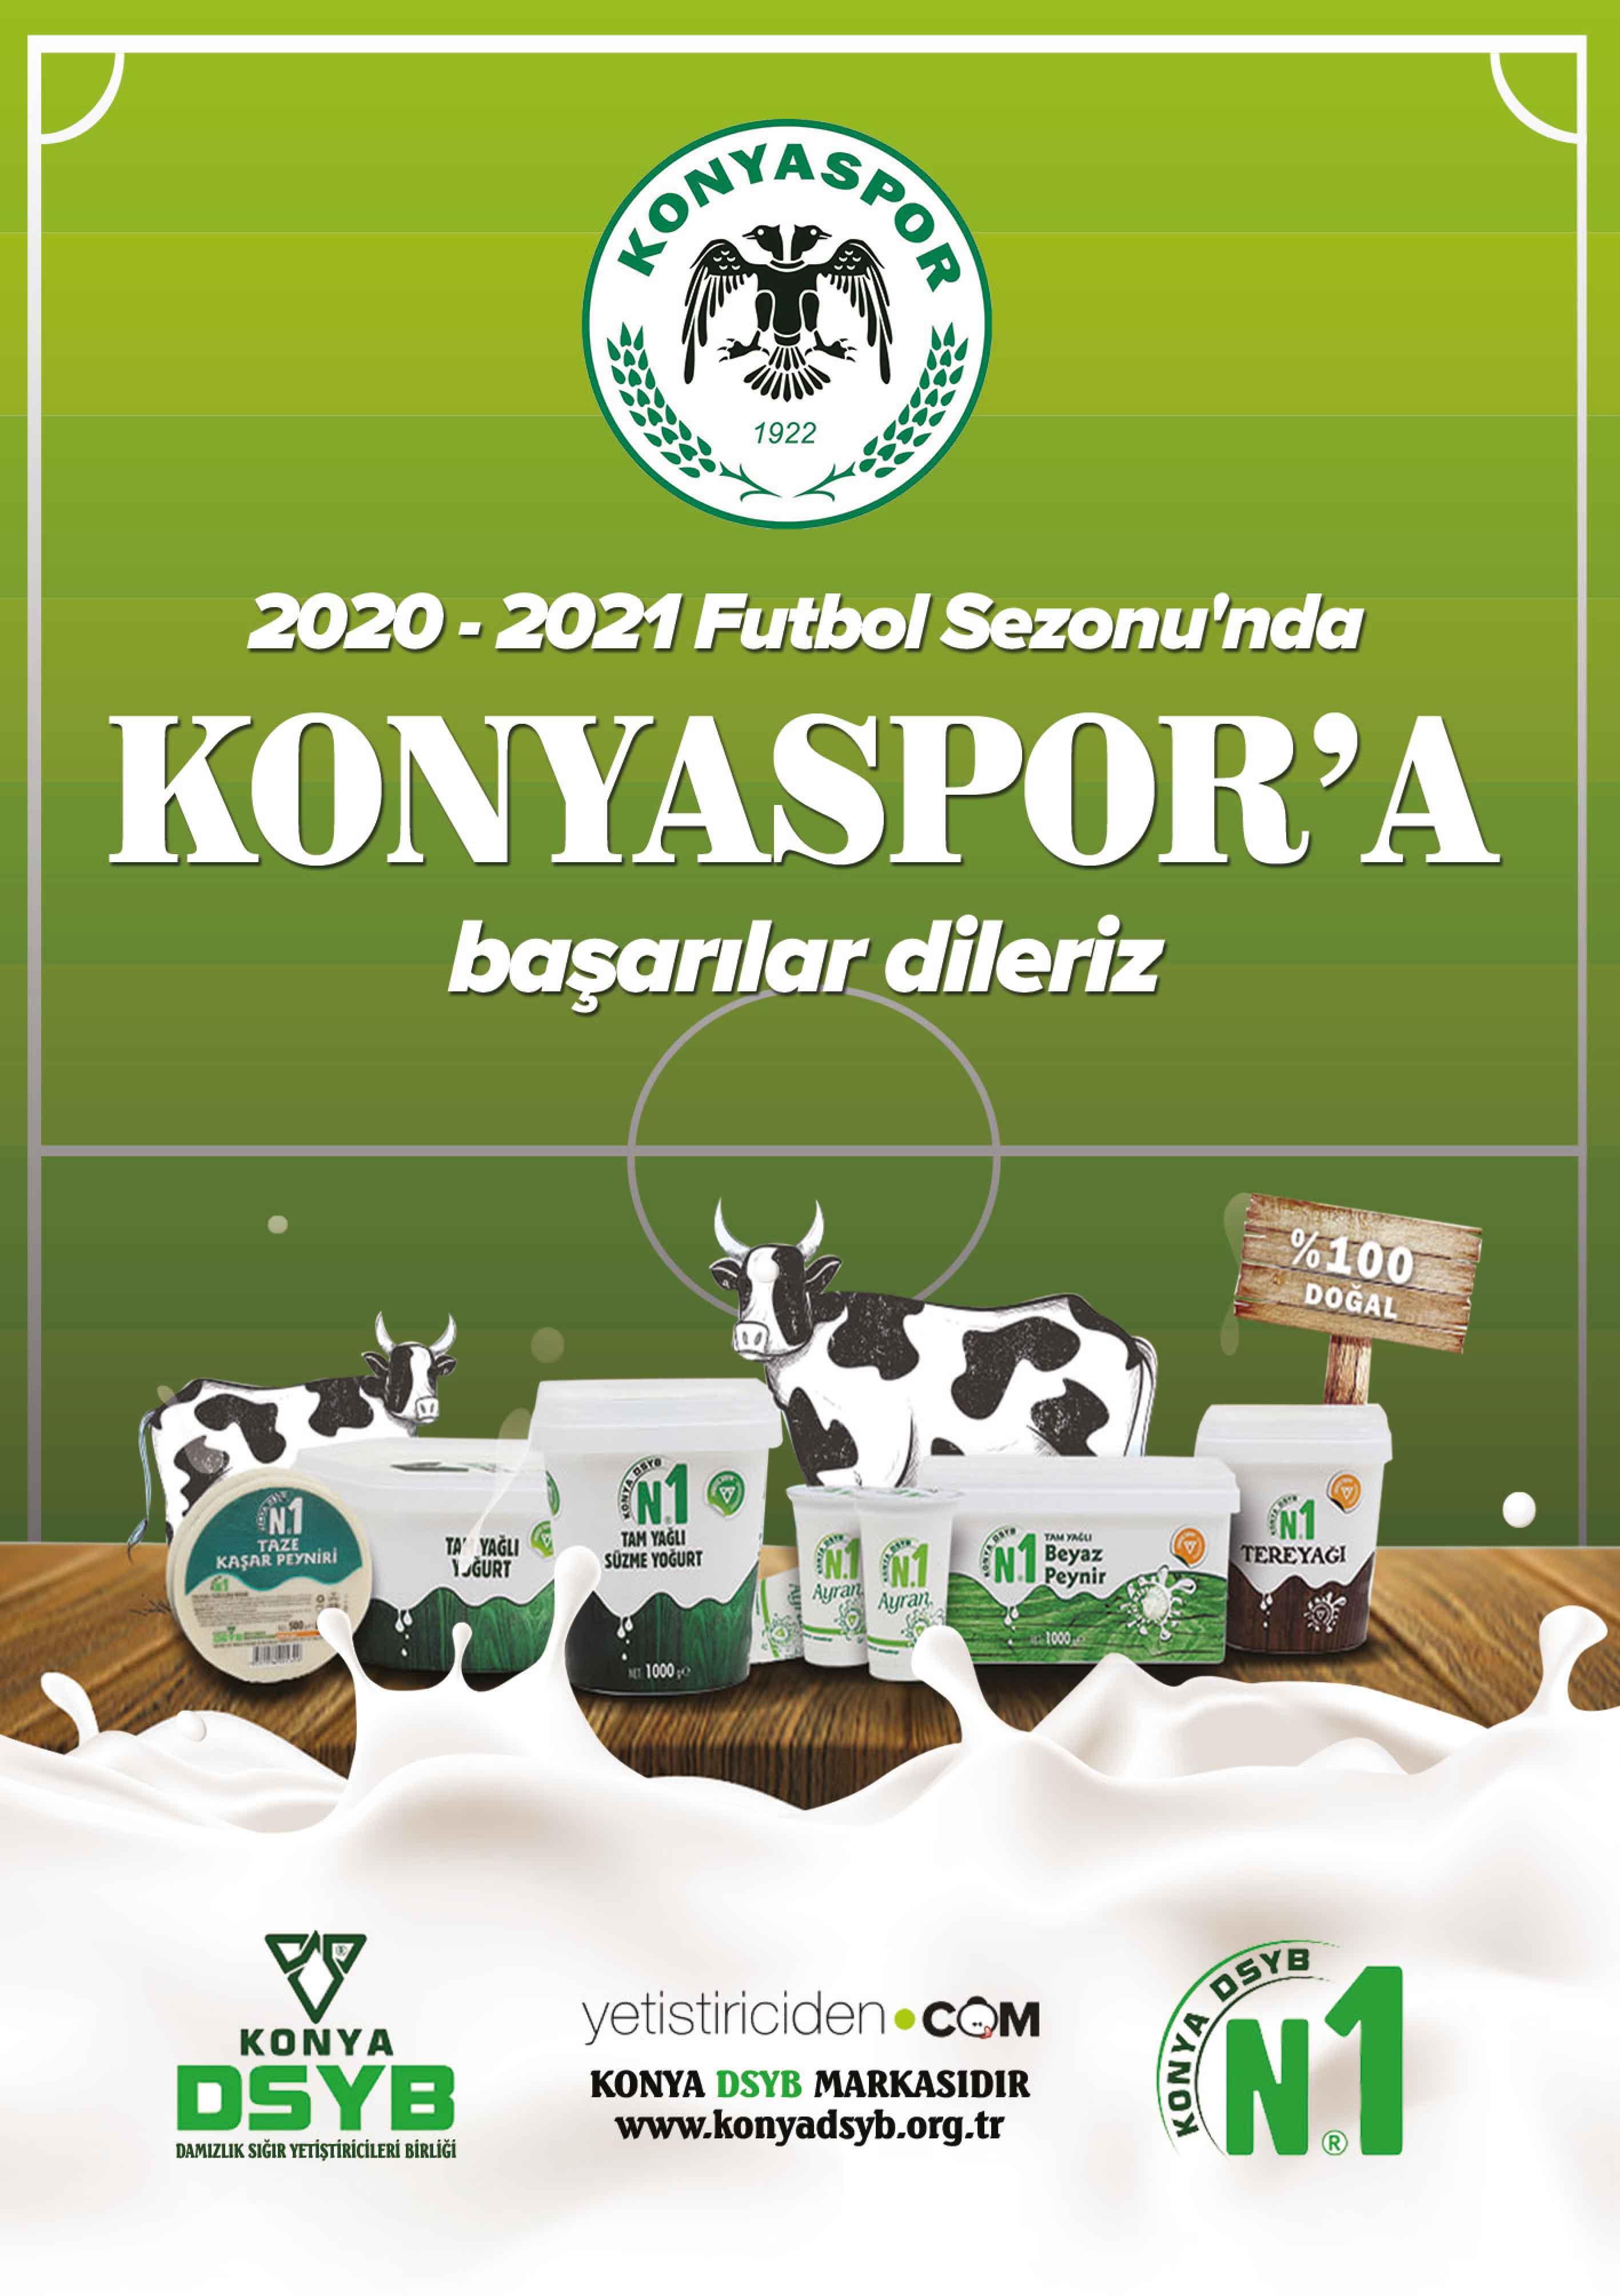 ih-konyaspor-2020-2021-fiksturu-028.jpg